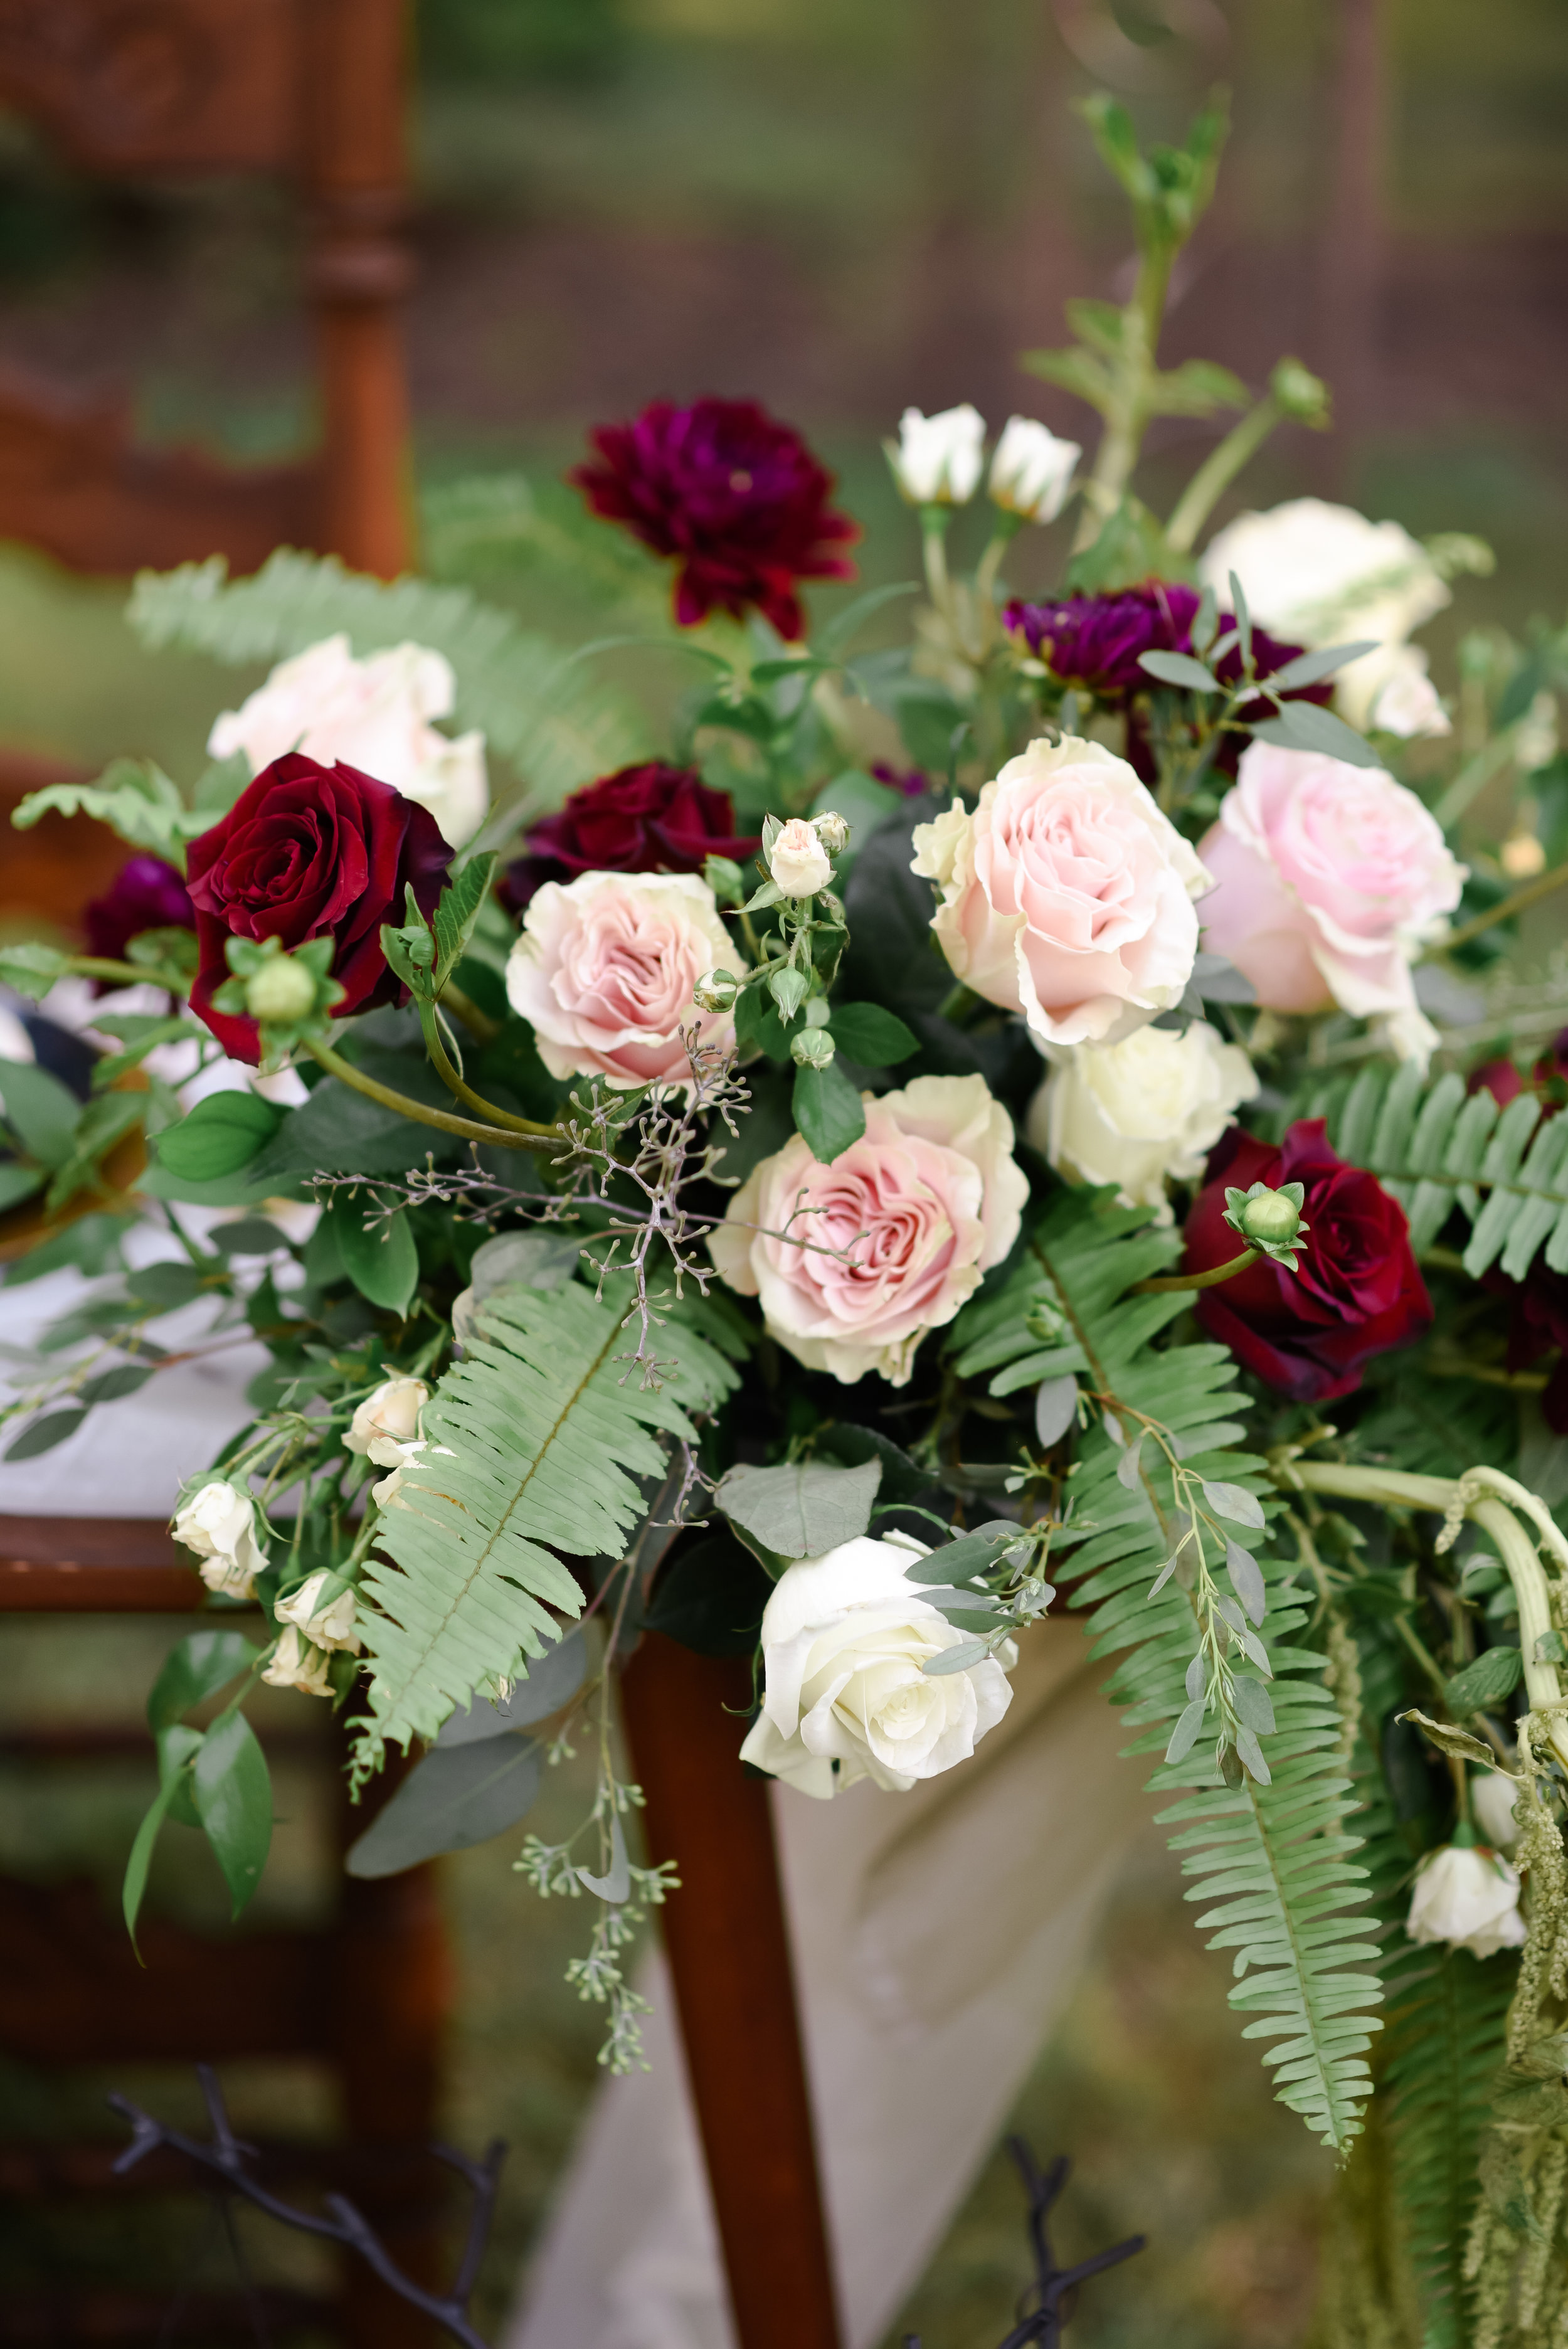 midsummers-eve-wedding-floral-blush-dress-david-tutera-cary-hill-plantation-photo-virginia-bride-122.jpg